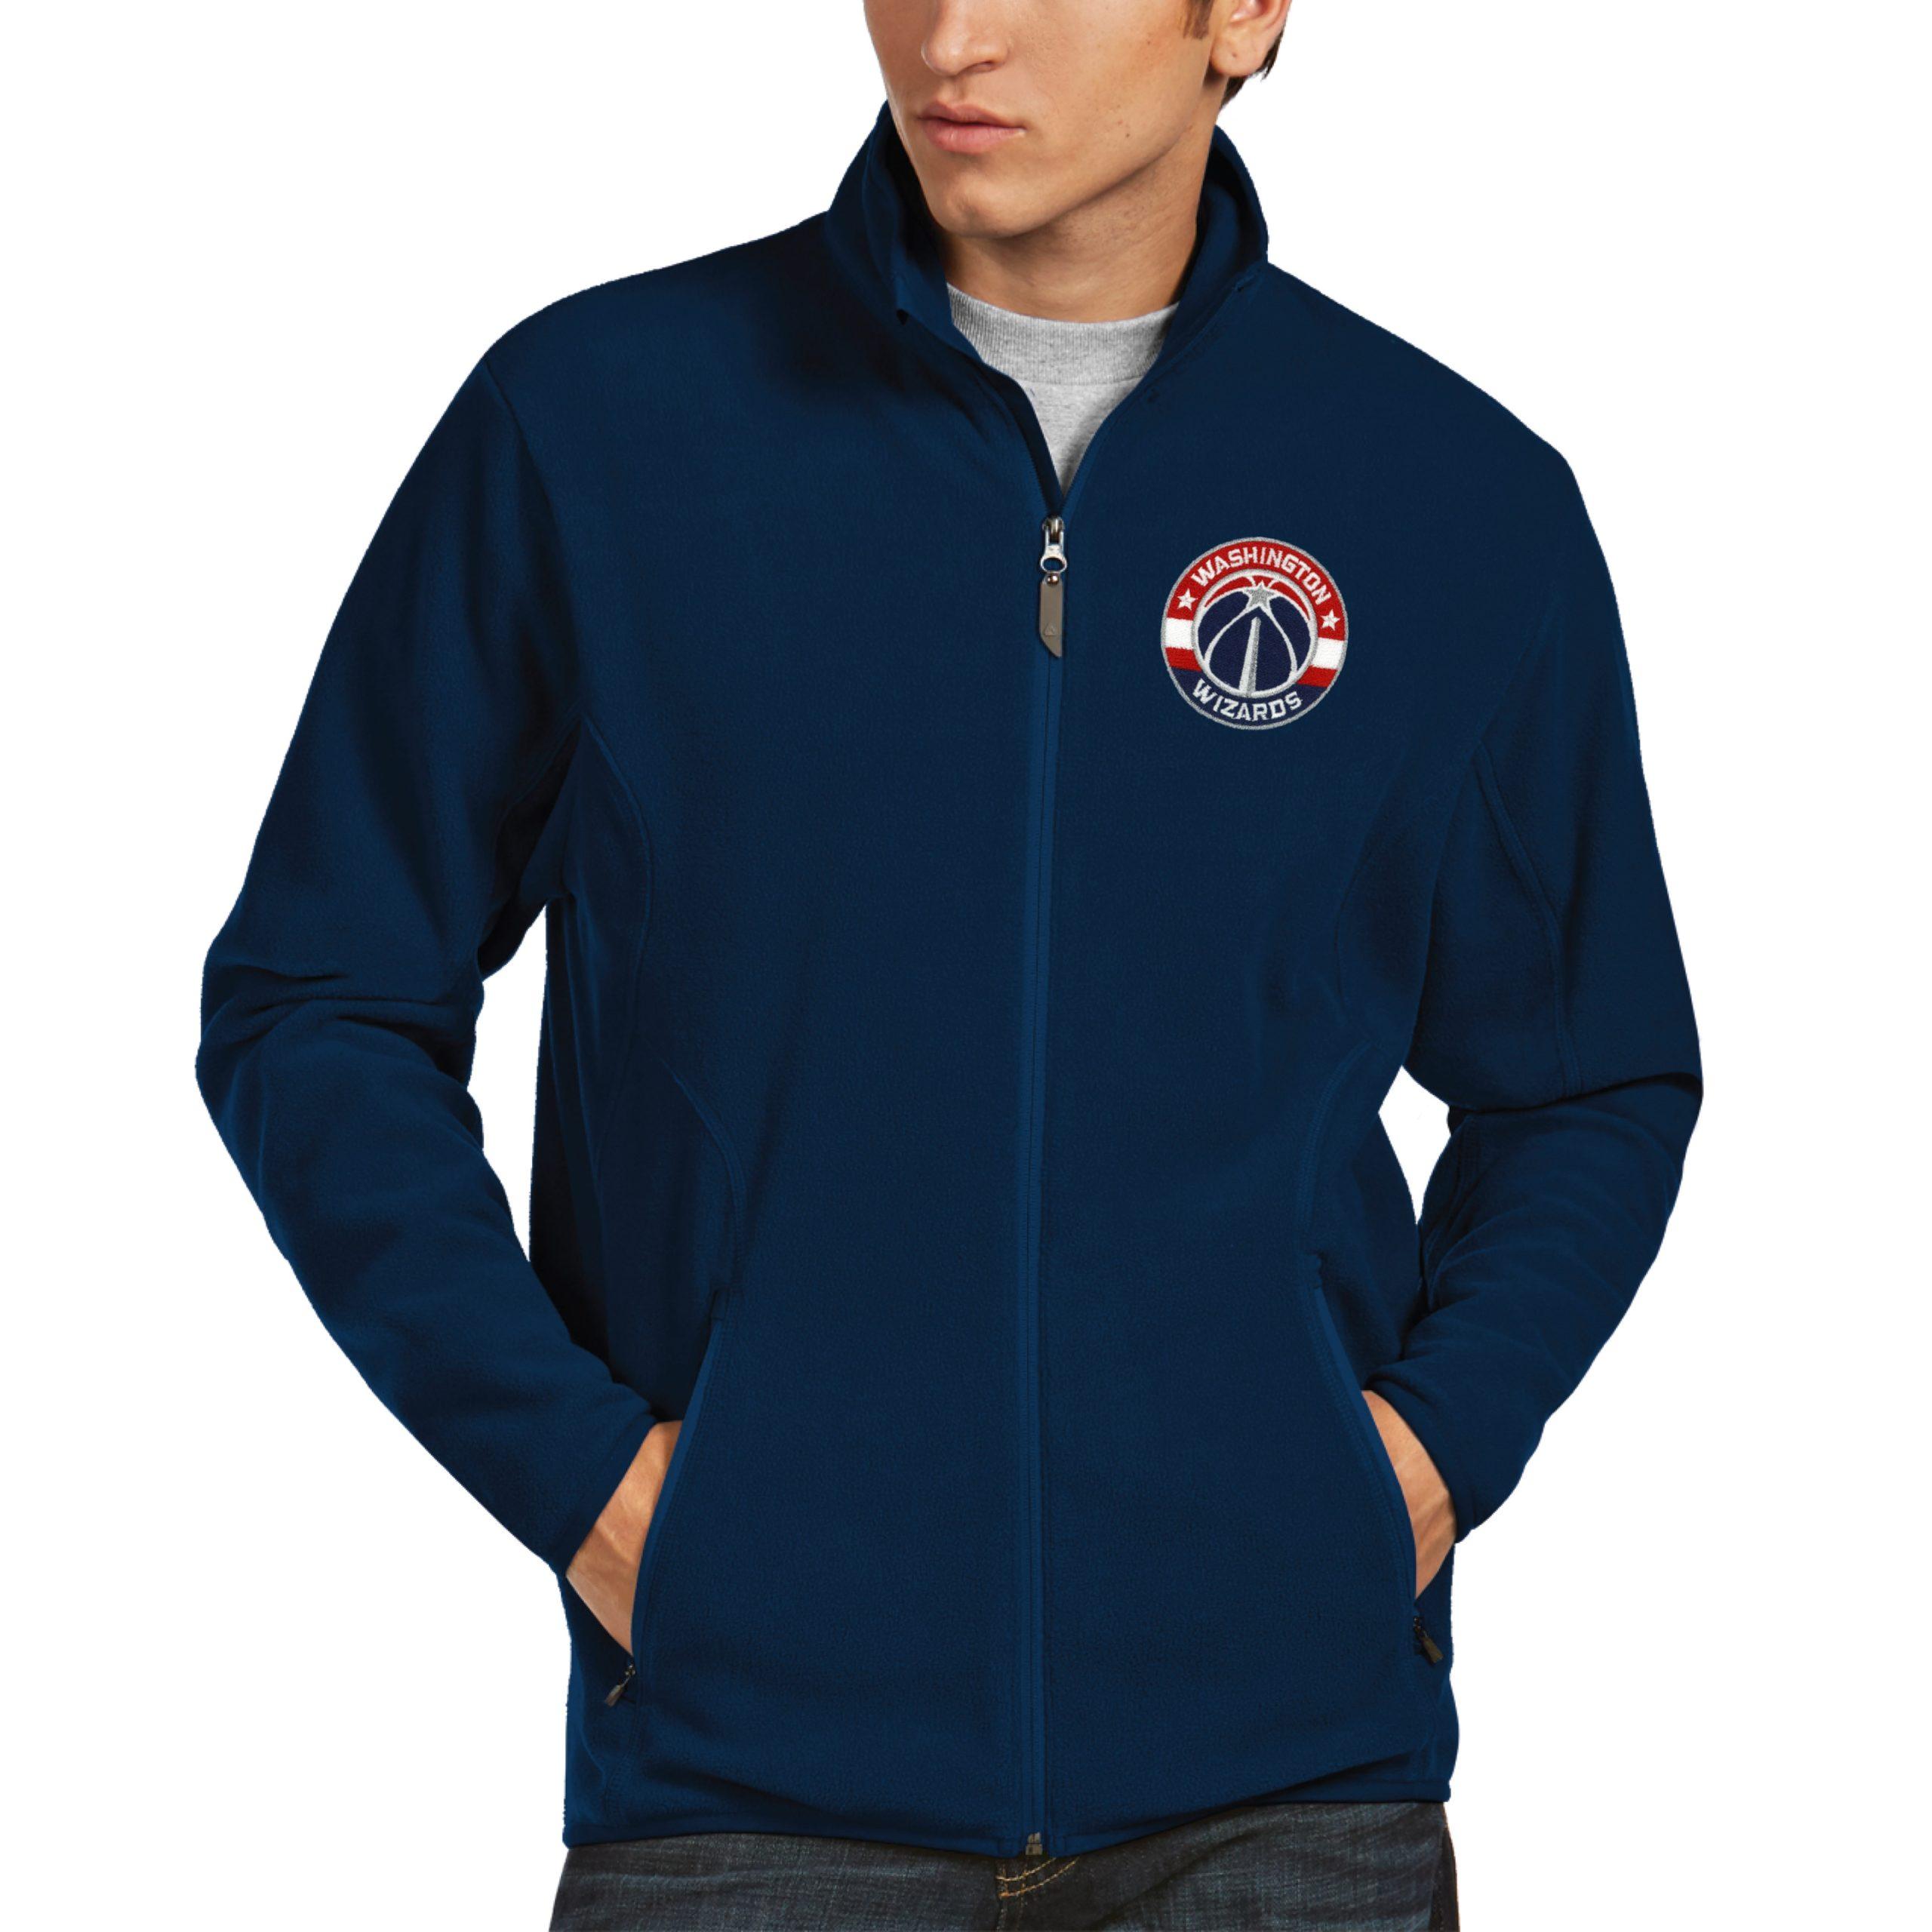 Washington Wizards Antigua Ice Full Zip Fleece Jacket - Navy